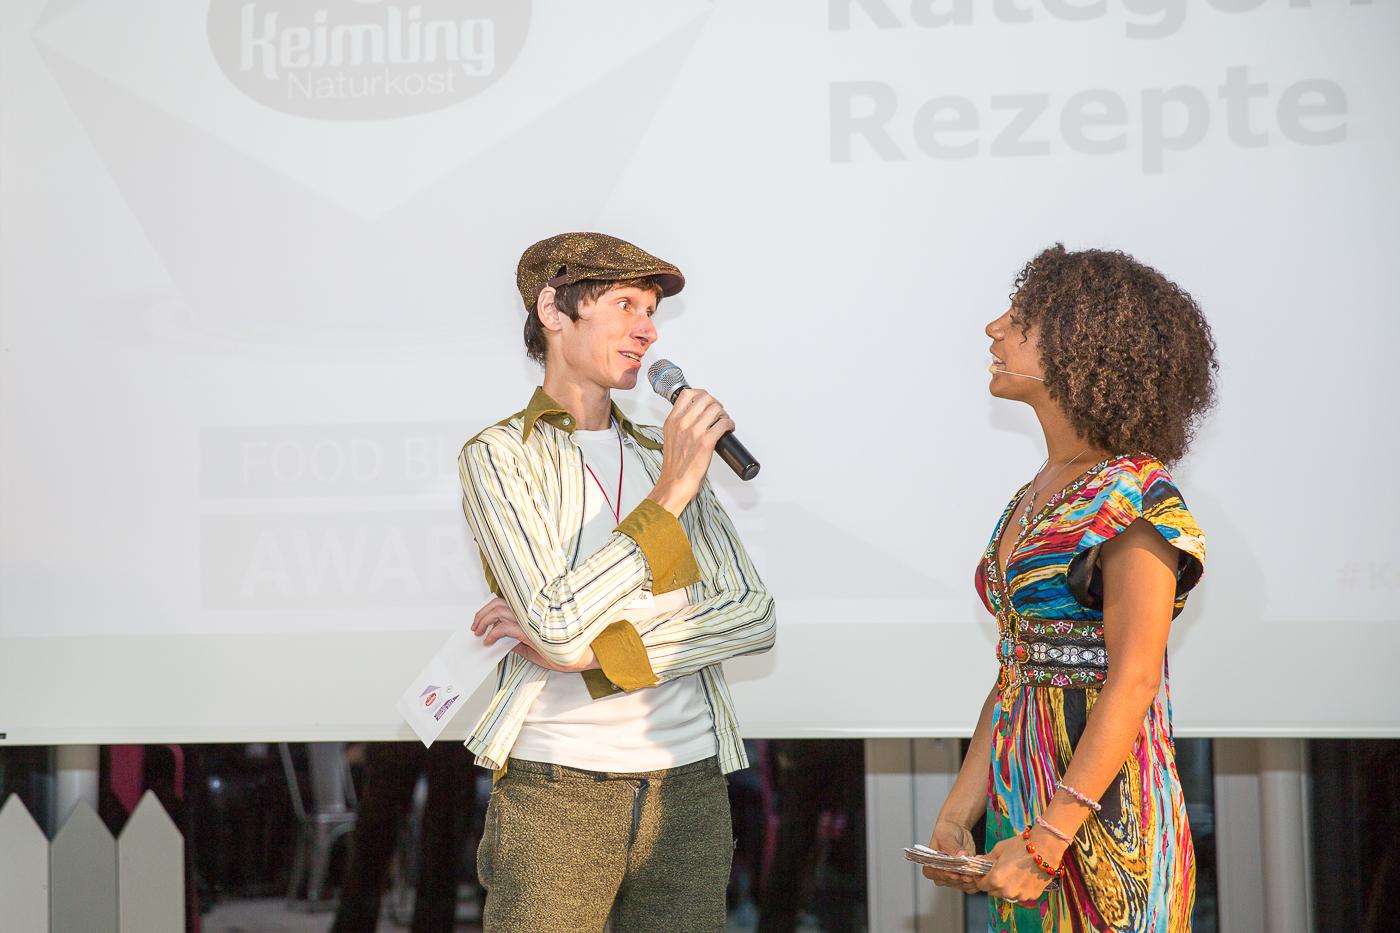 keimling award  Small47